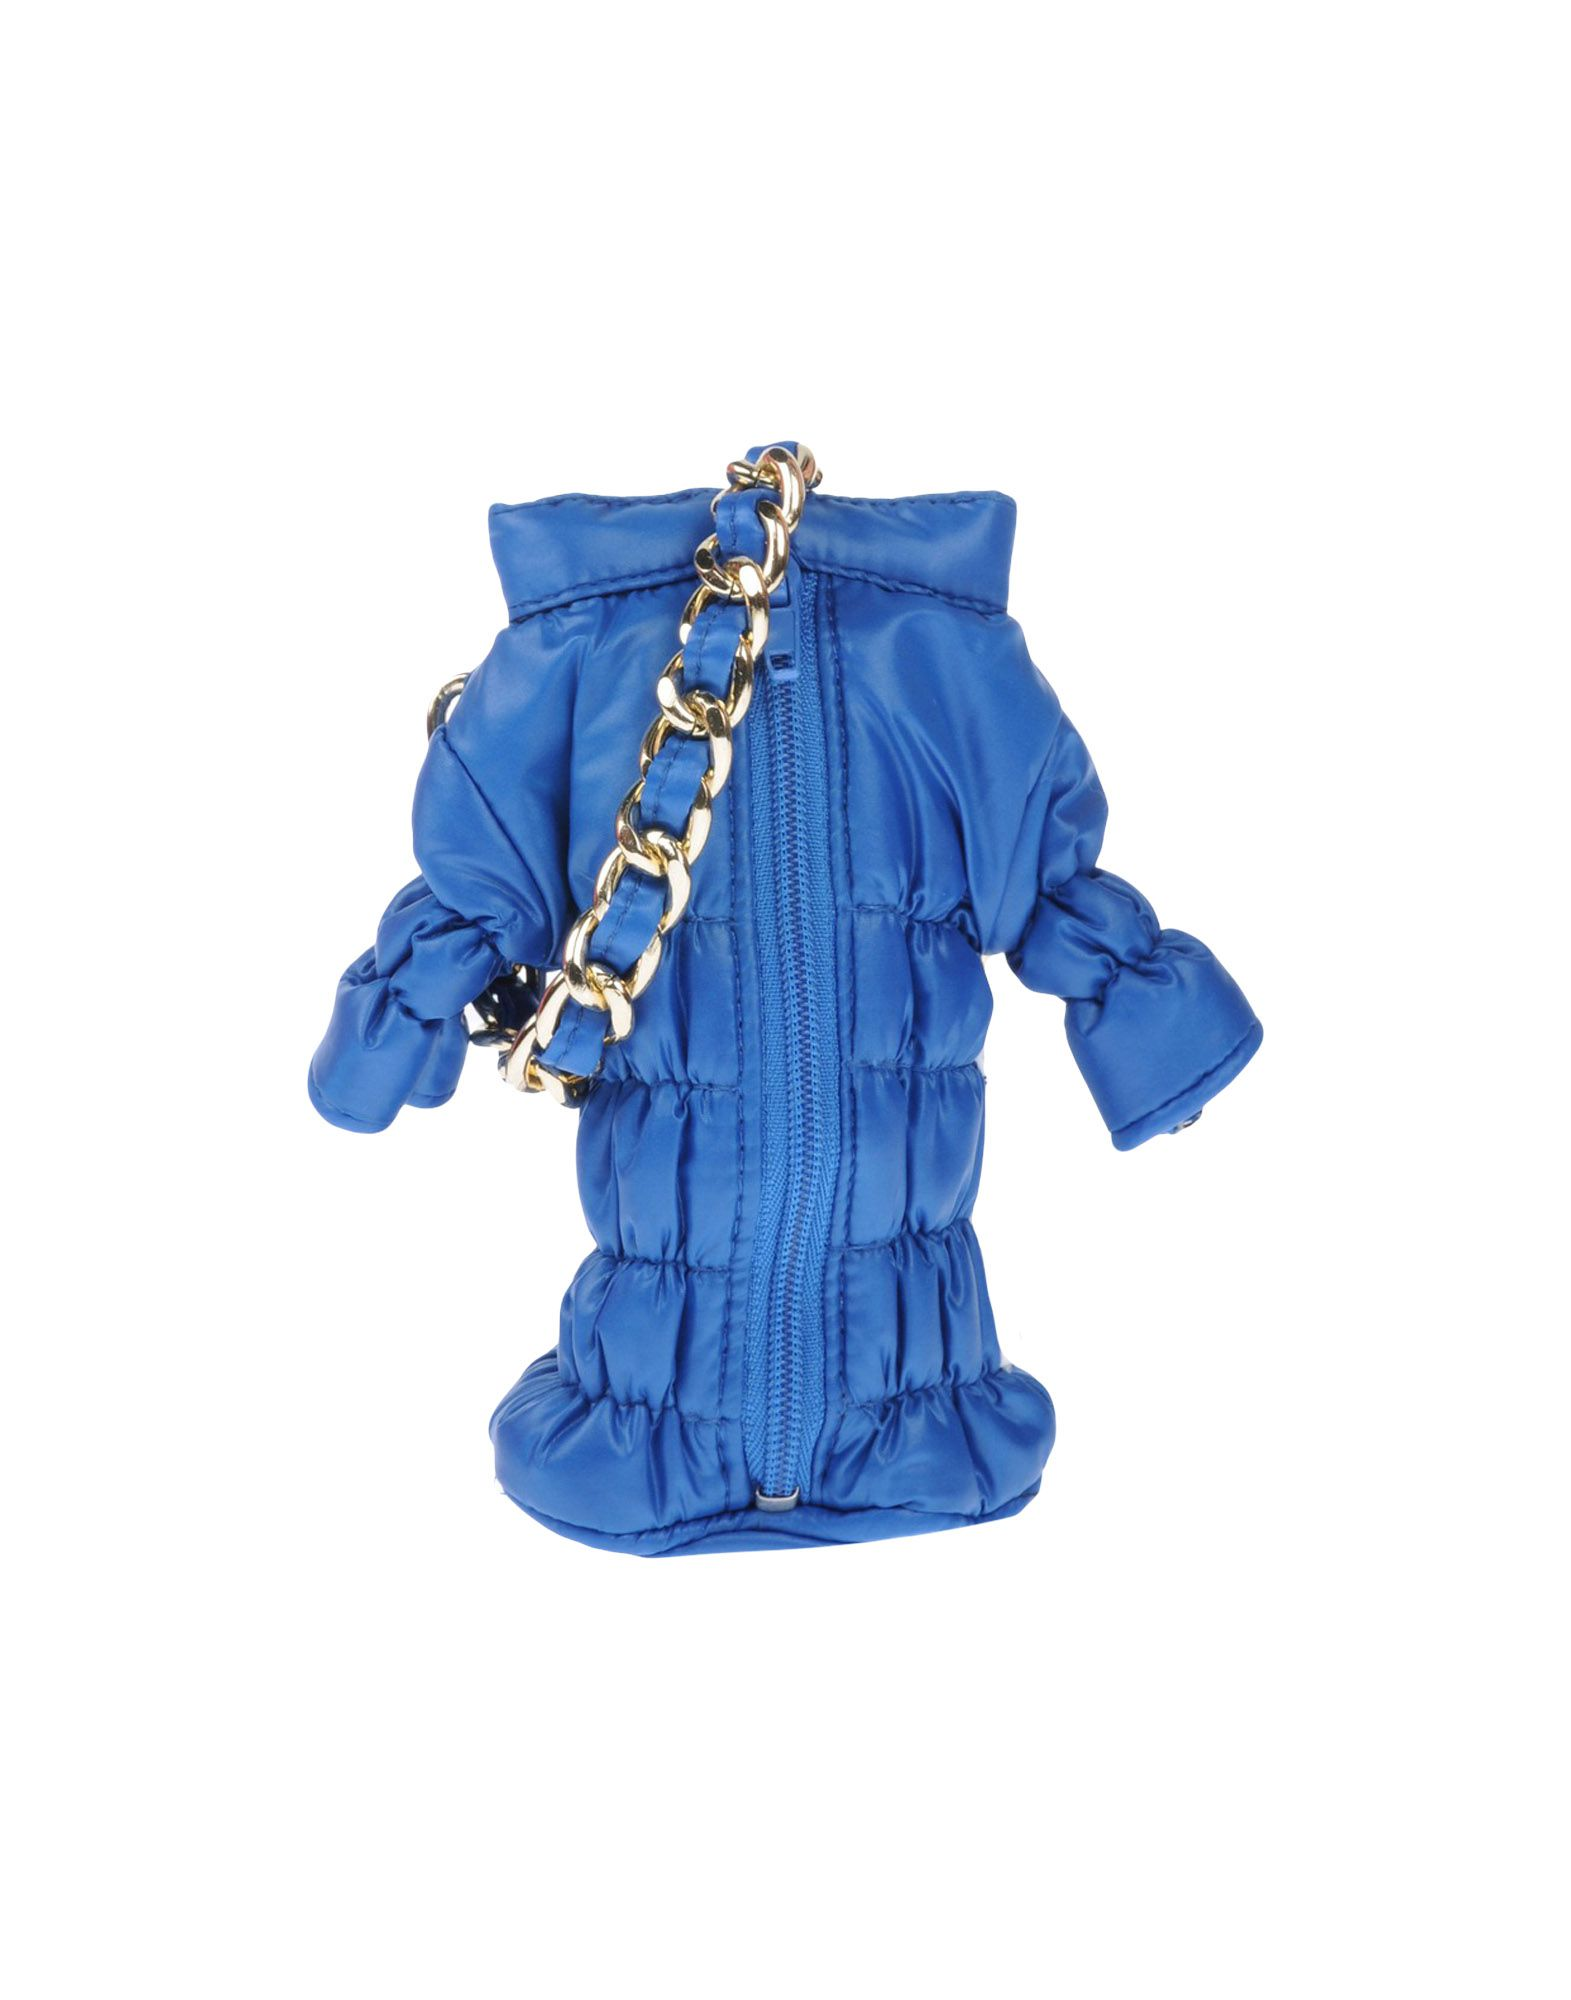 MOSCHINO Сумка через плечо сумка через плечо anais gvani croco ag 1471 350161